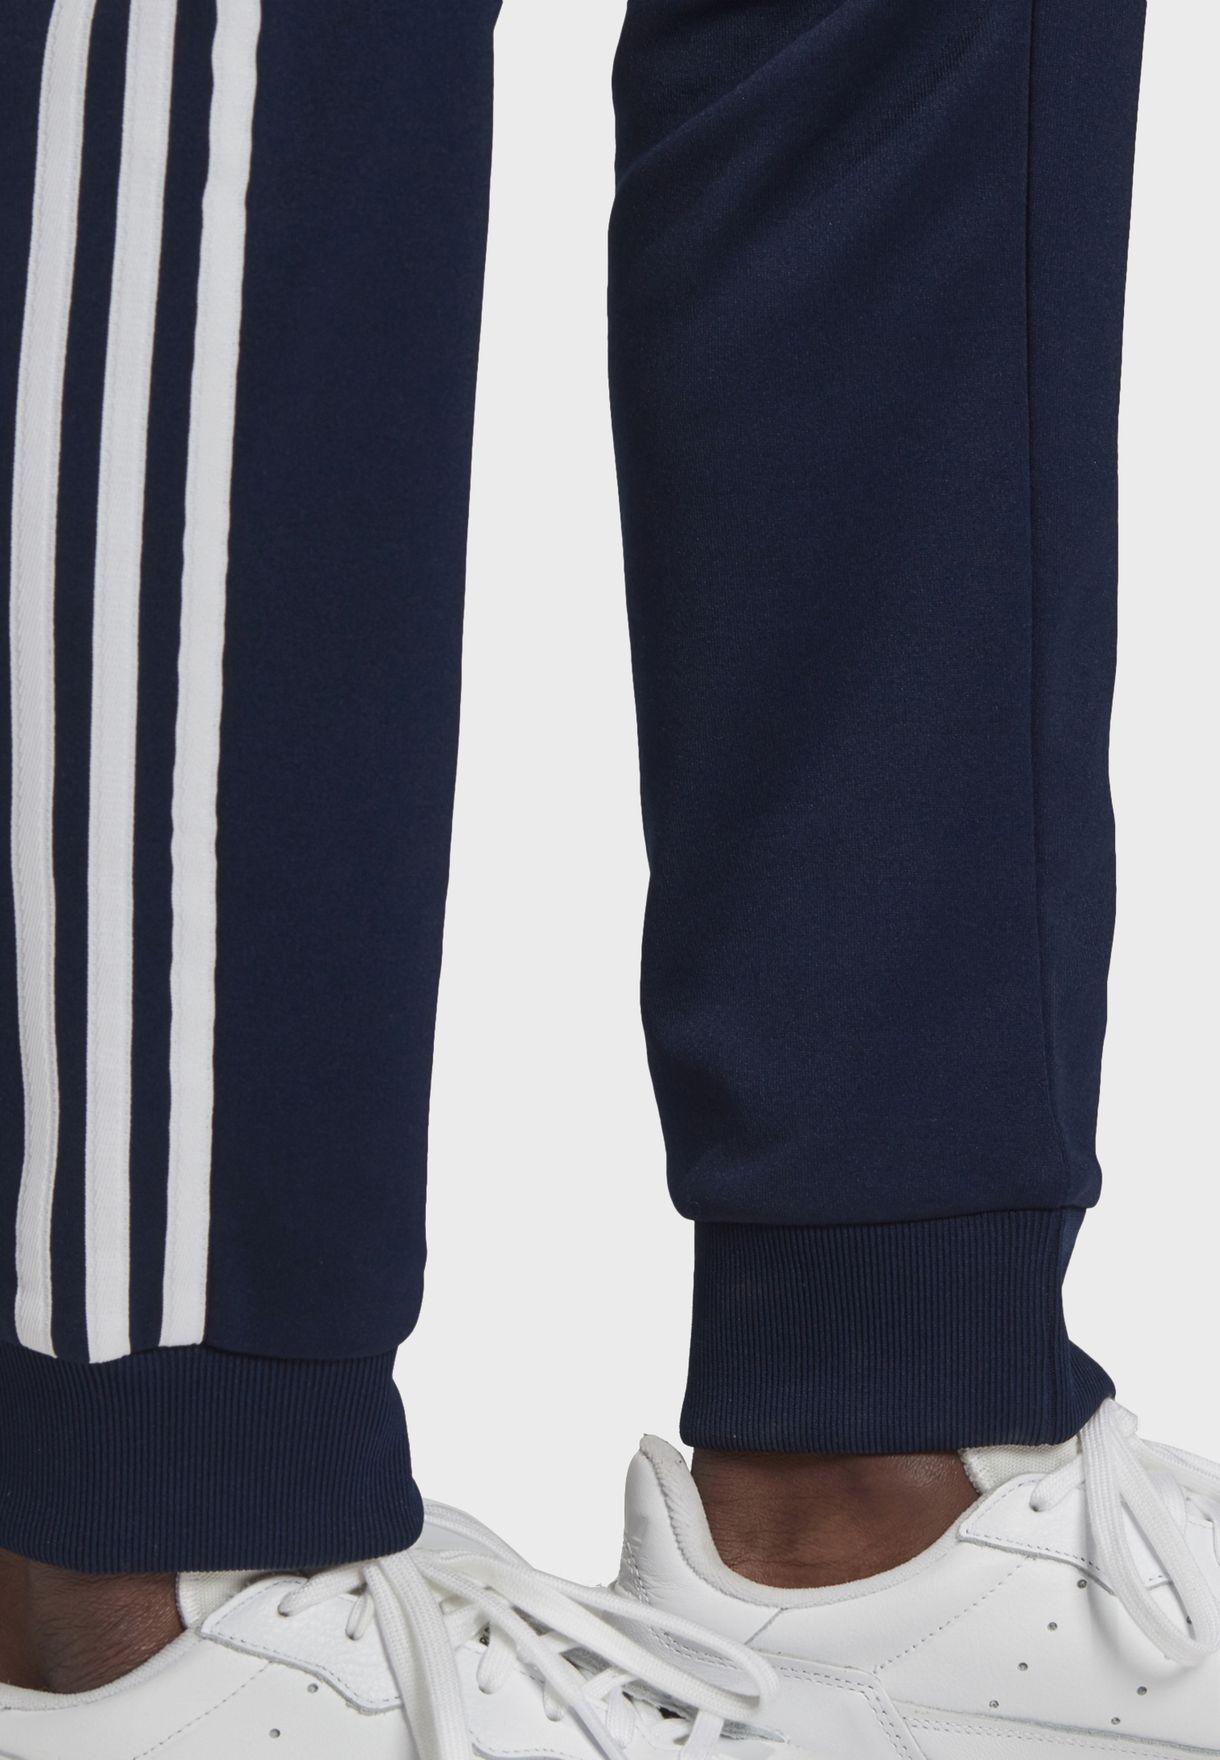 adicolor Superstar Sweatpants